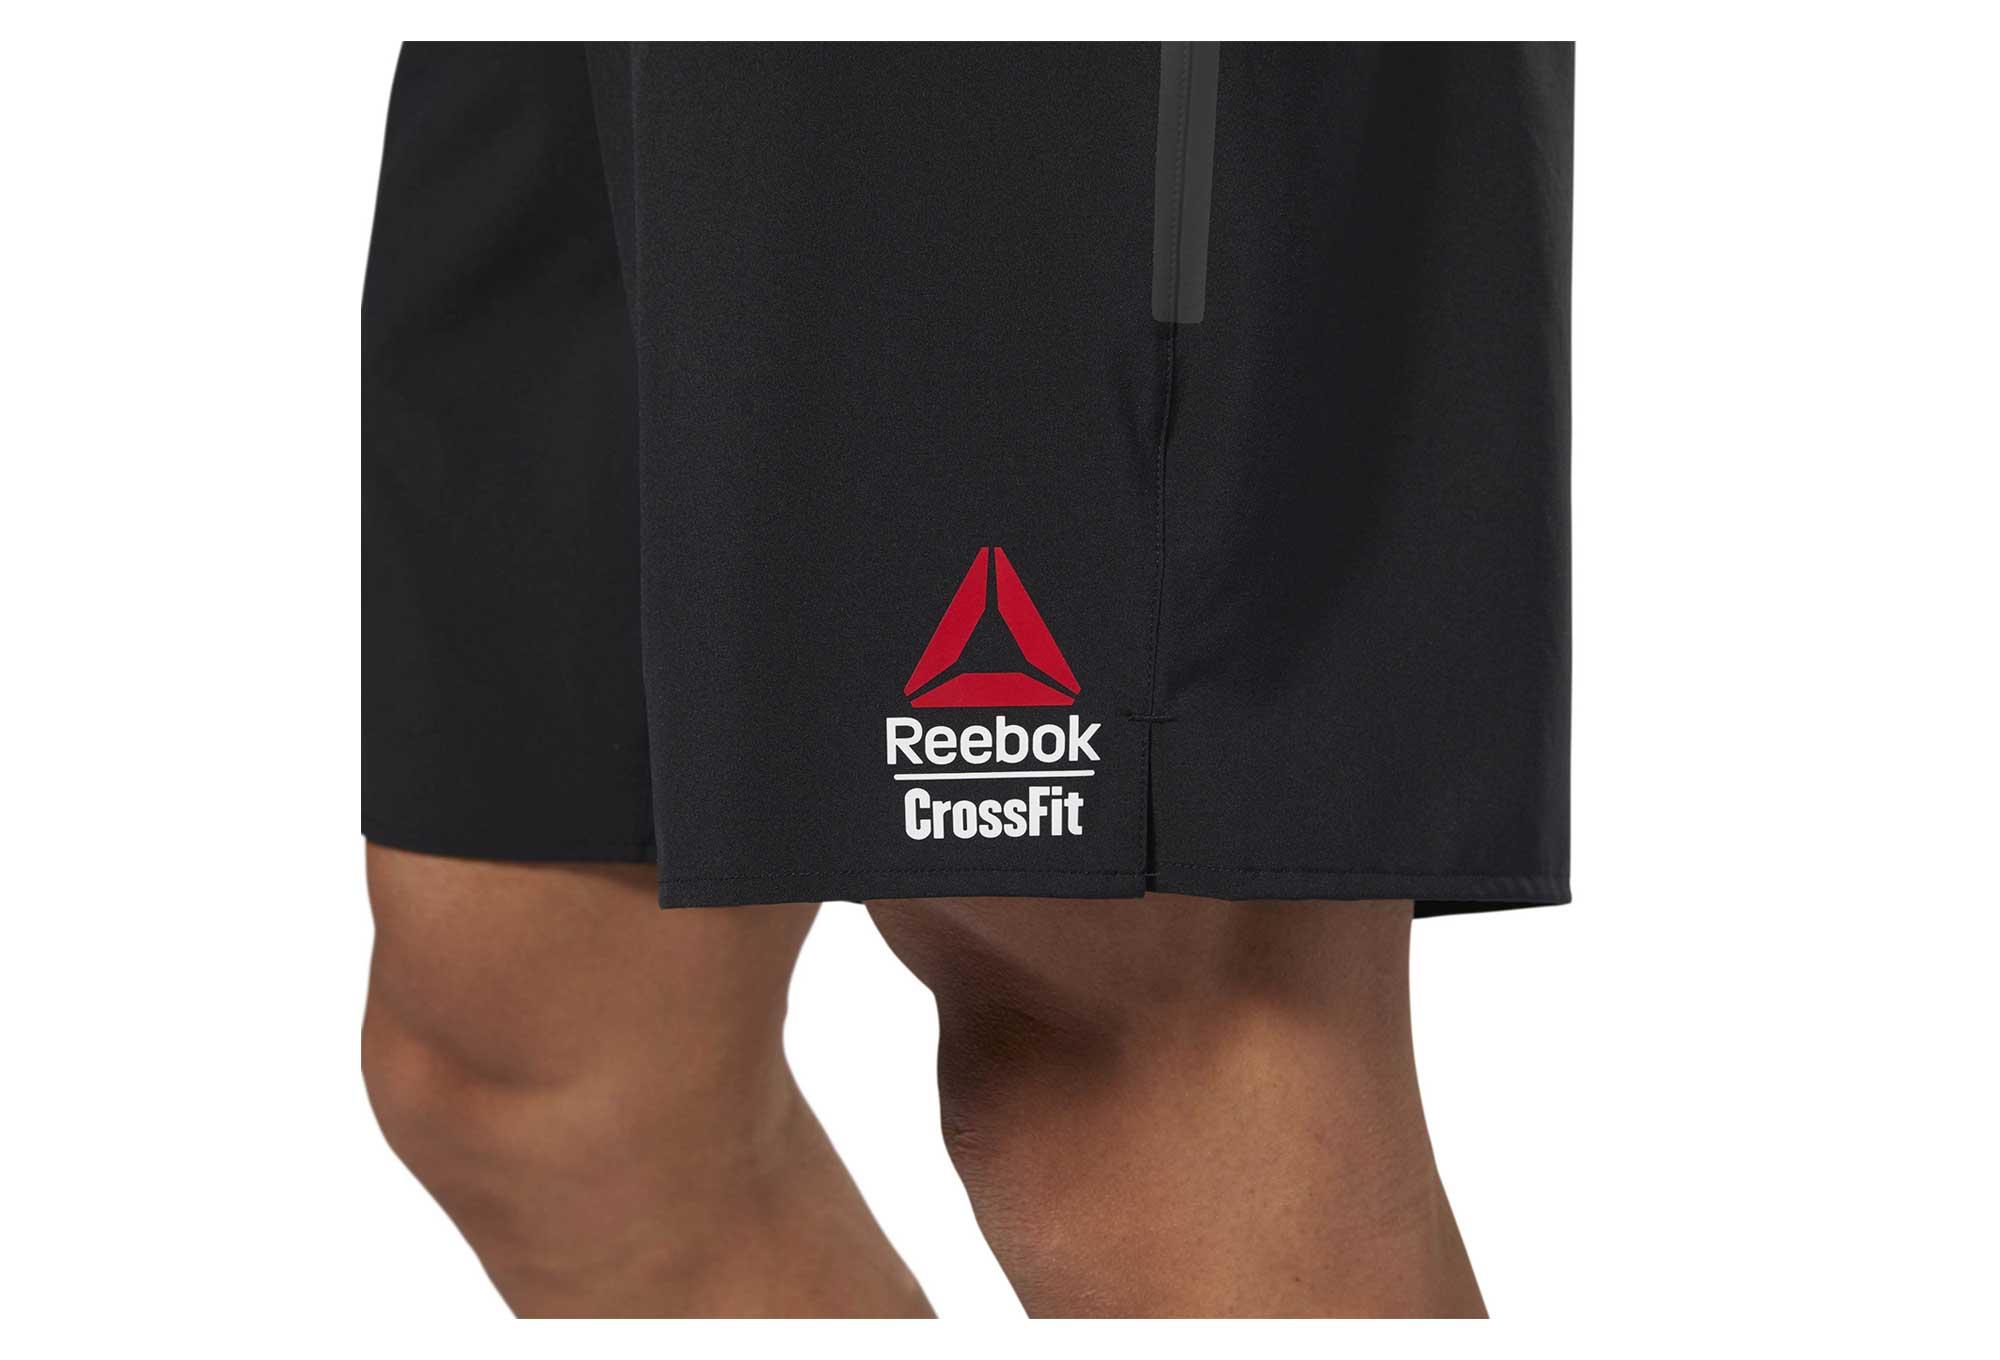 Reebok Crossfit Games Speed Noir Short rdCoBWQxe